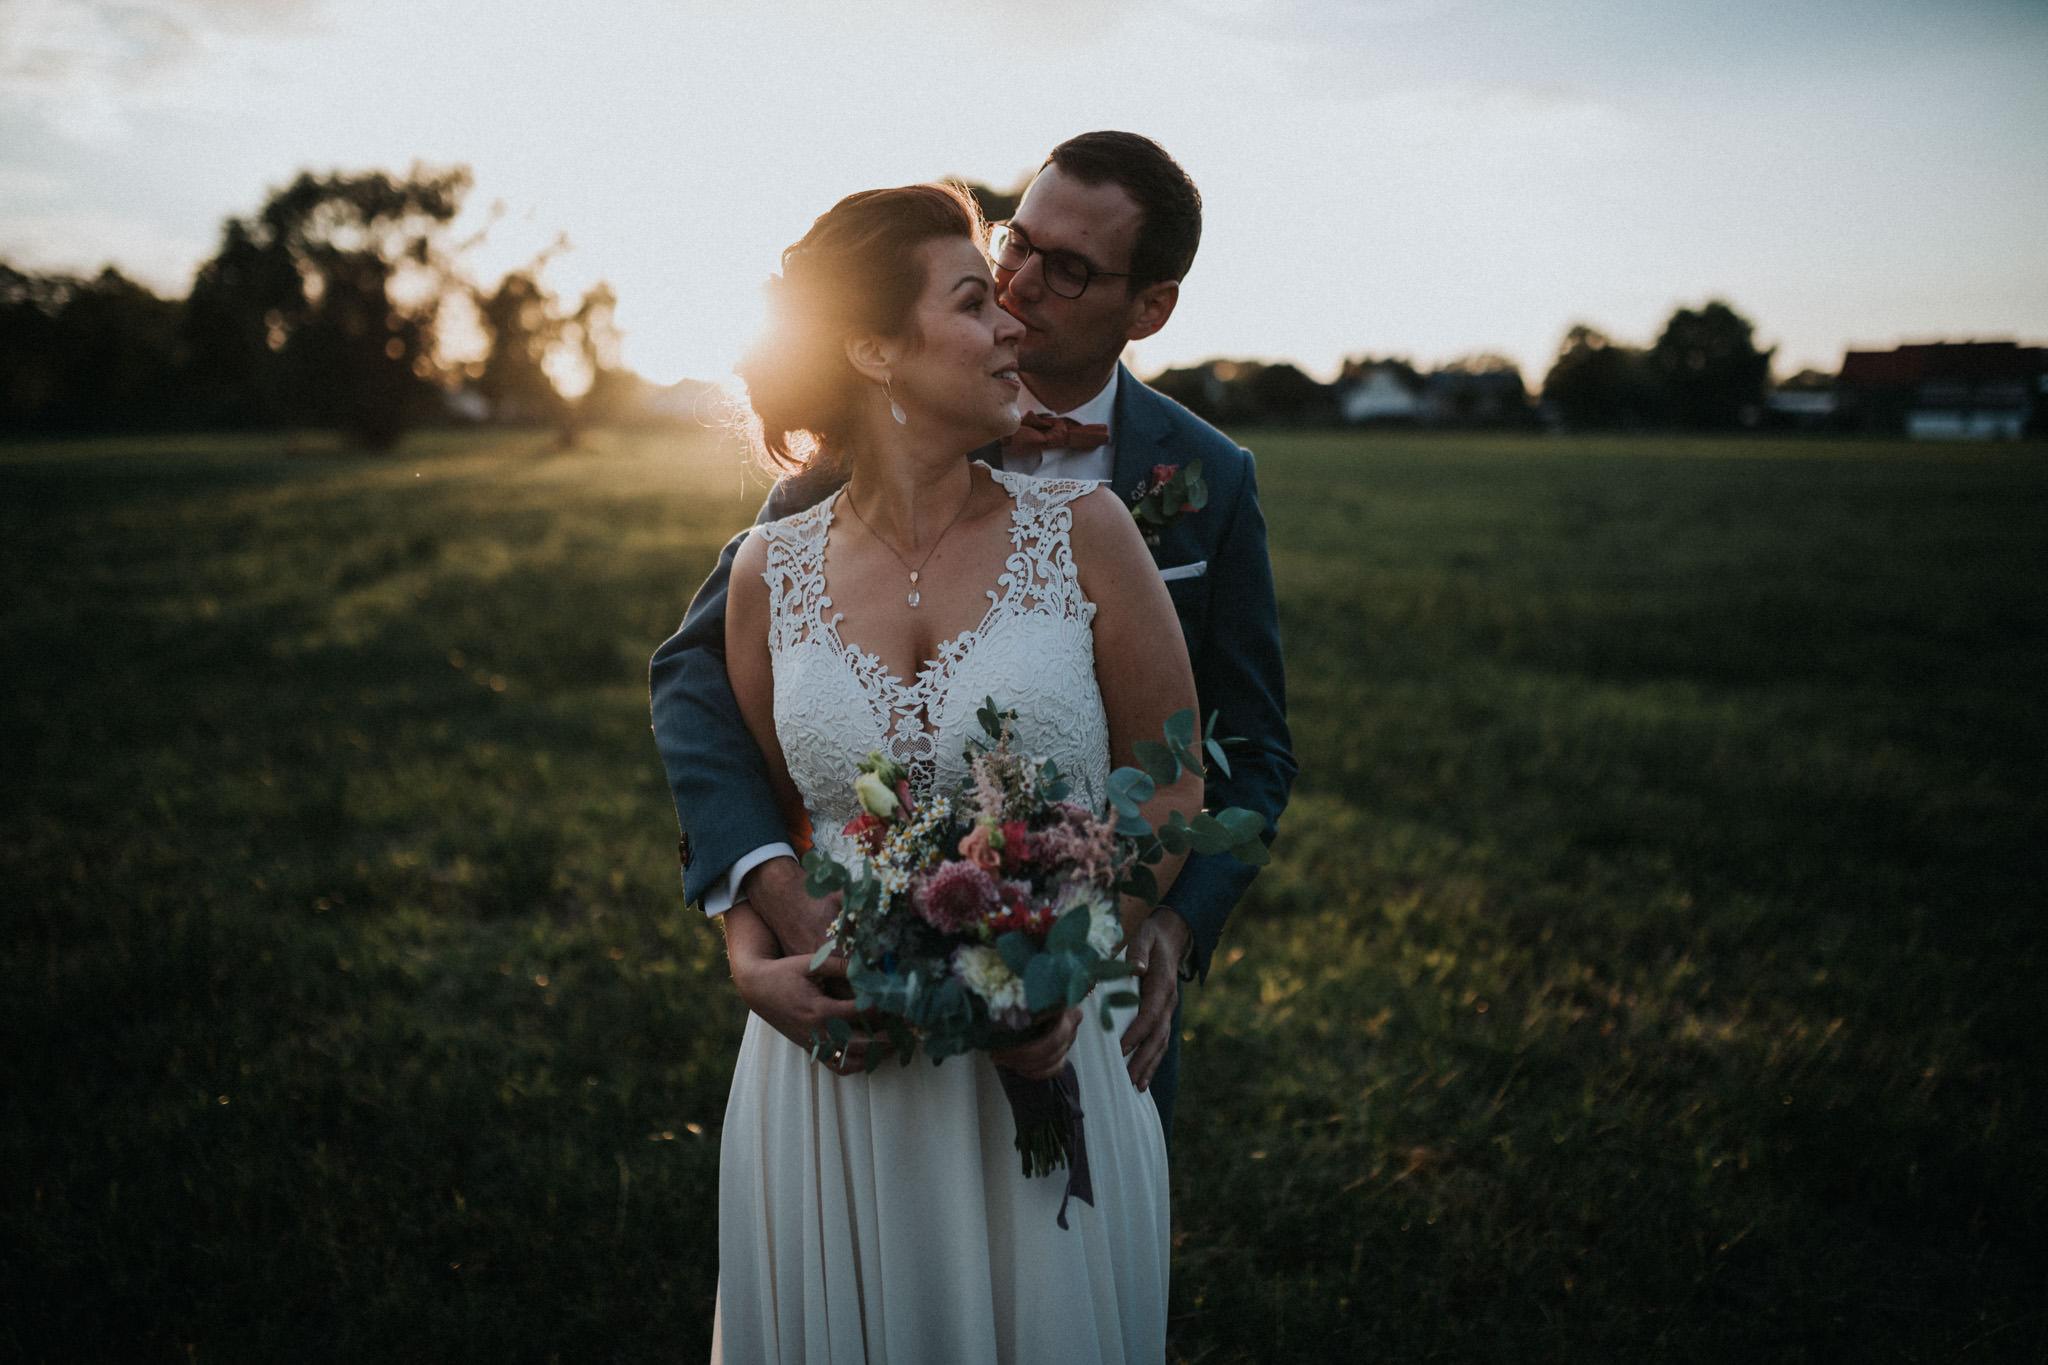 Hochzeitsfotograf-Homberg-58.jpg